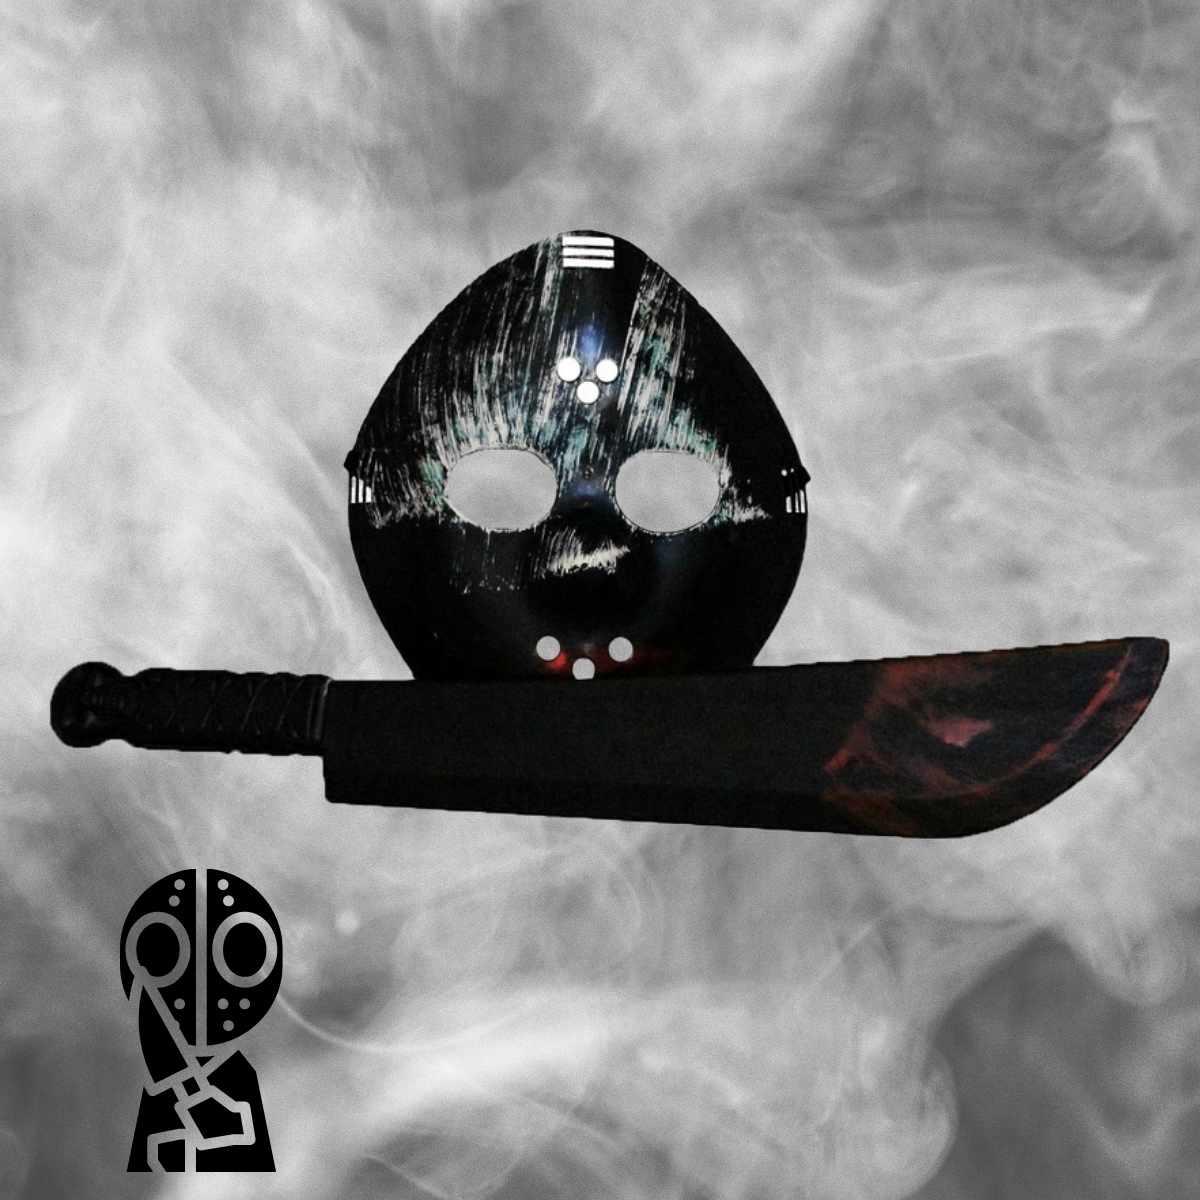 Kit Jason Acessórios (Máscara e Facão)